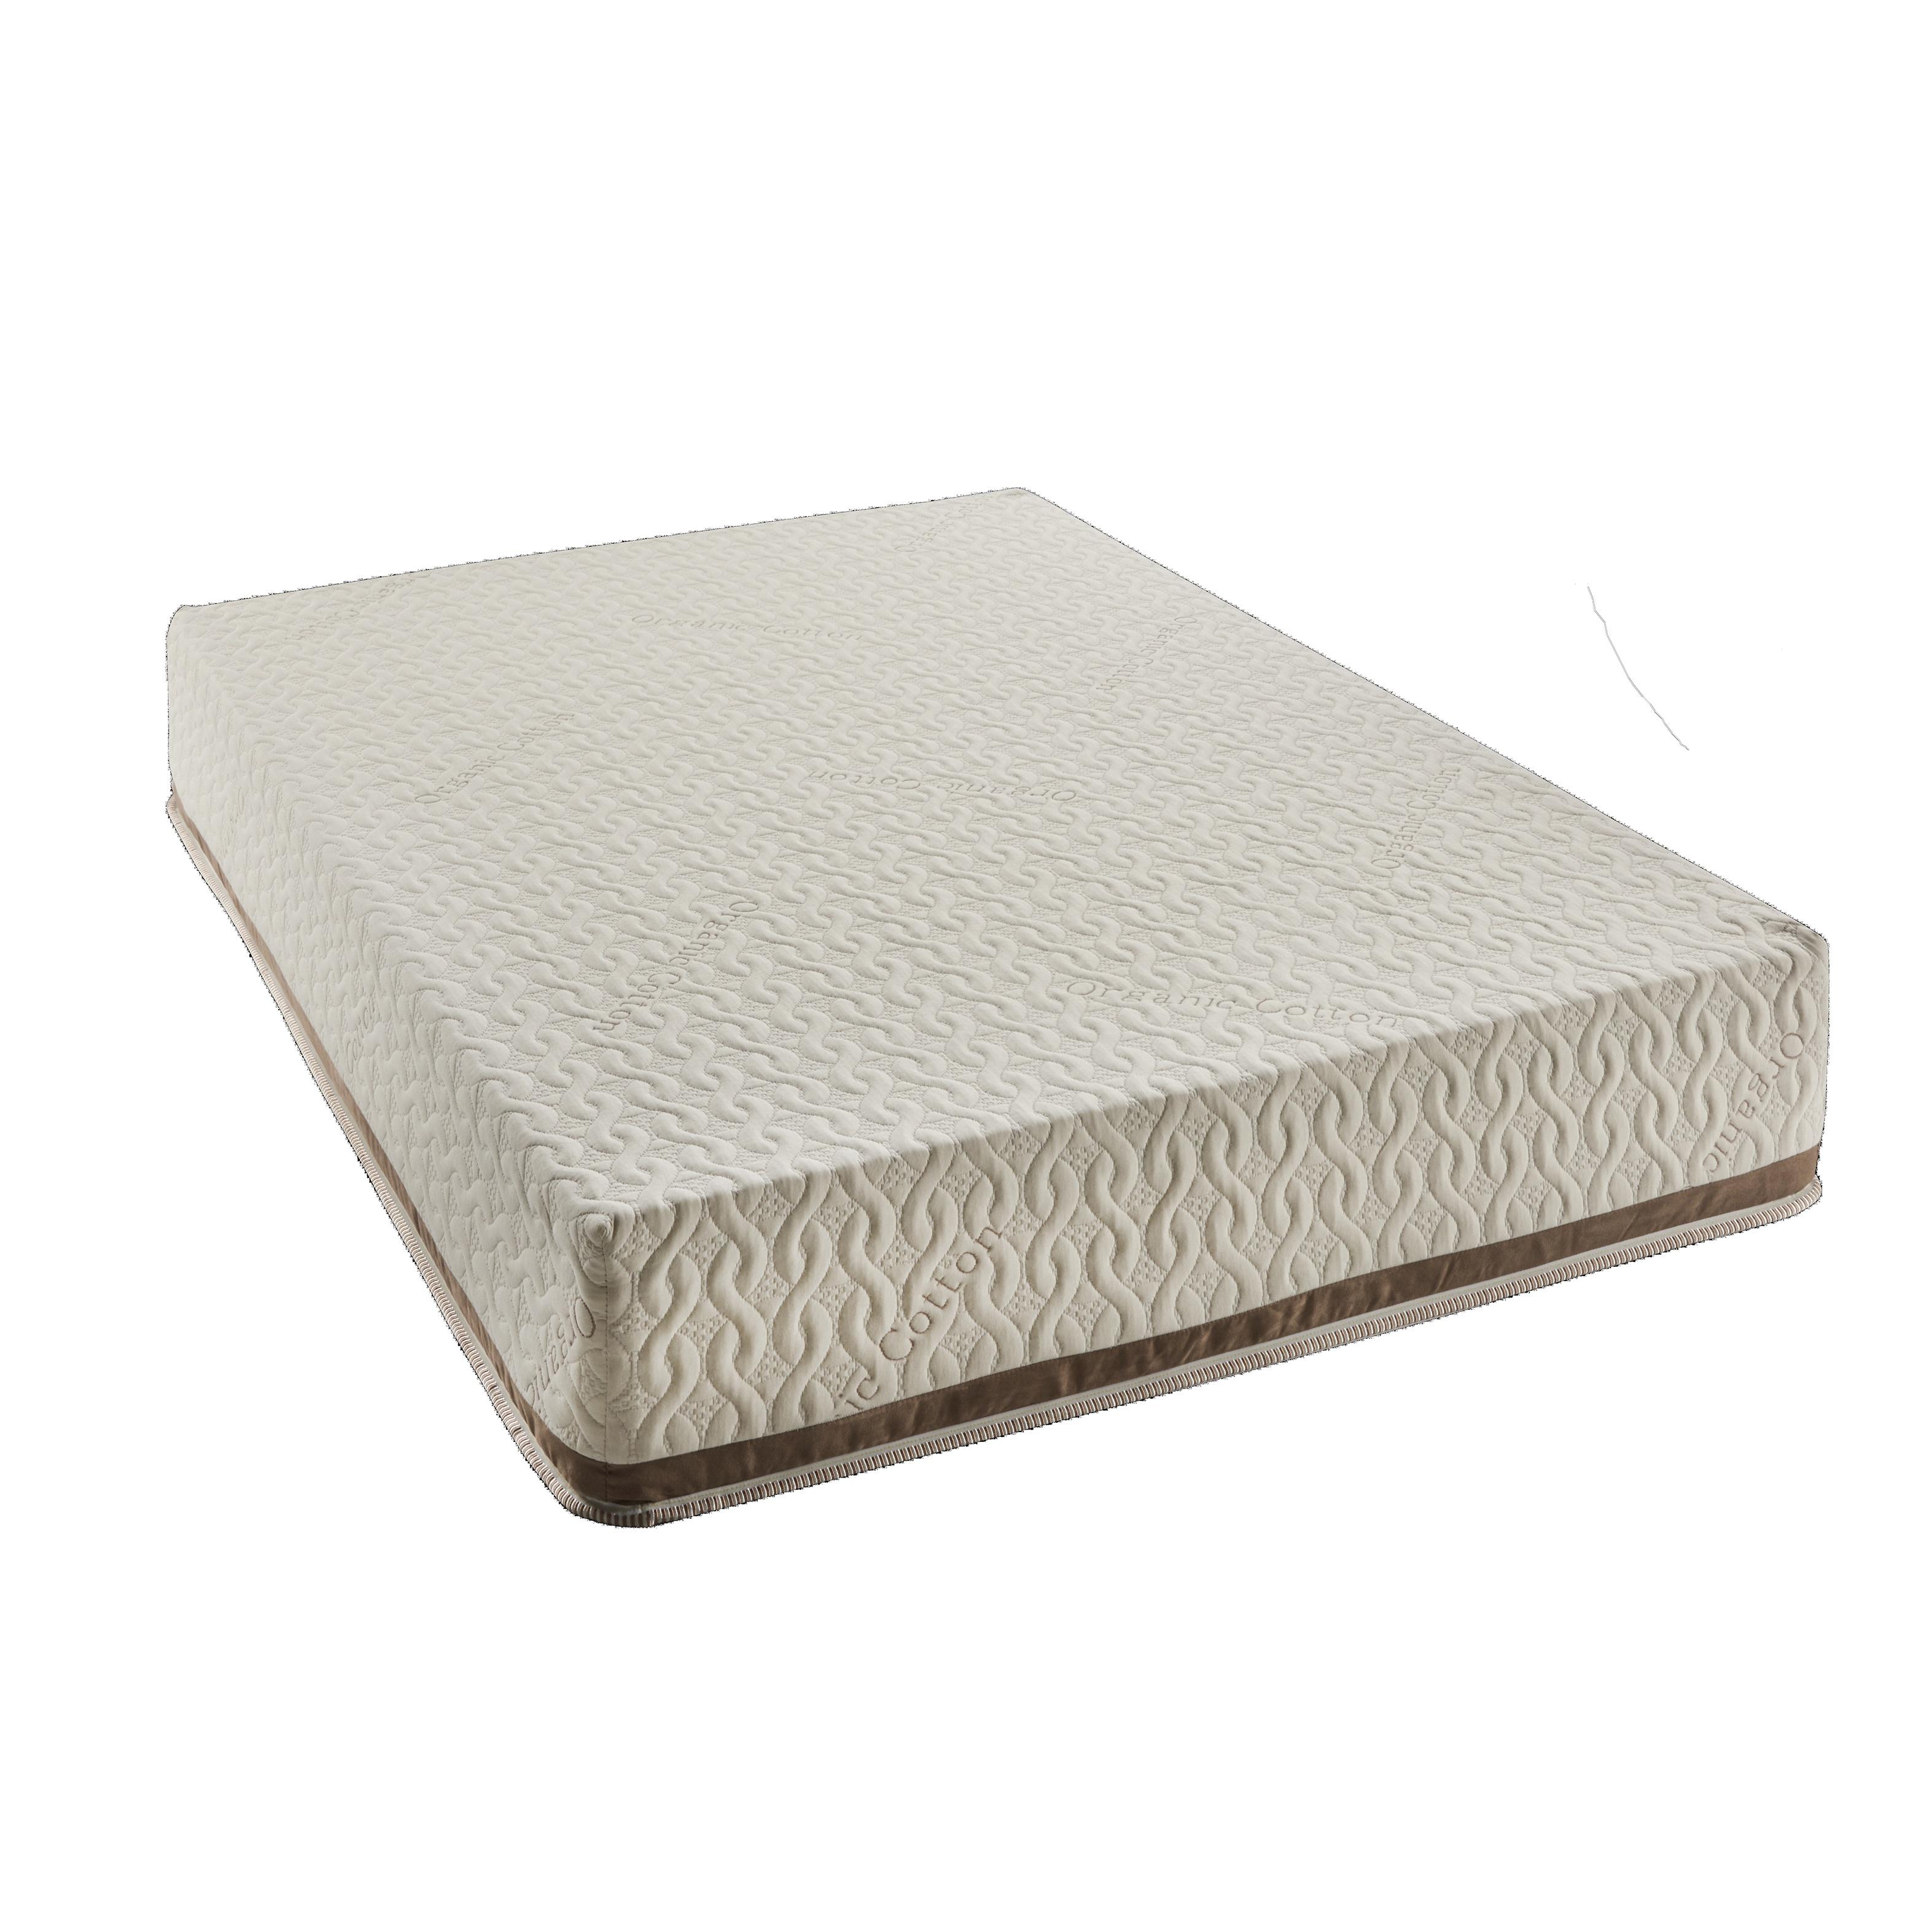 mattress queen zone euro green luxury new spring high foam latex final density quality pocket top size angel